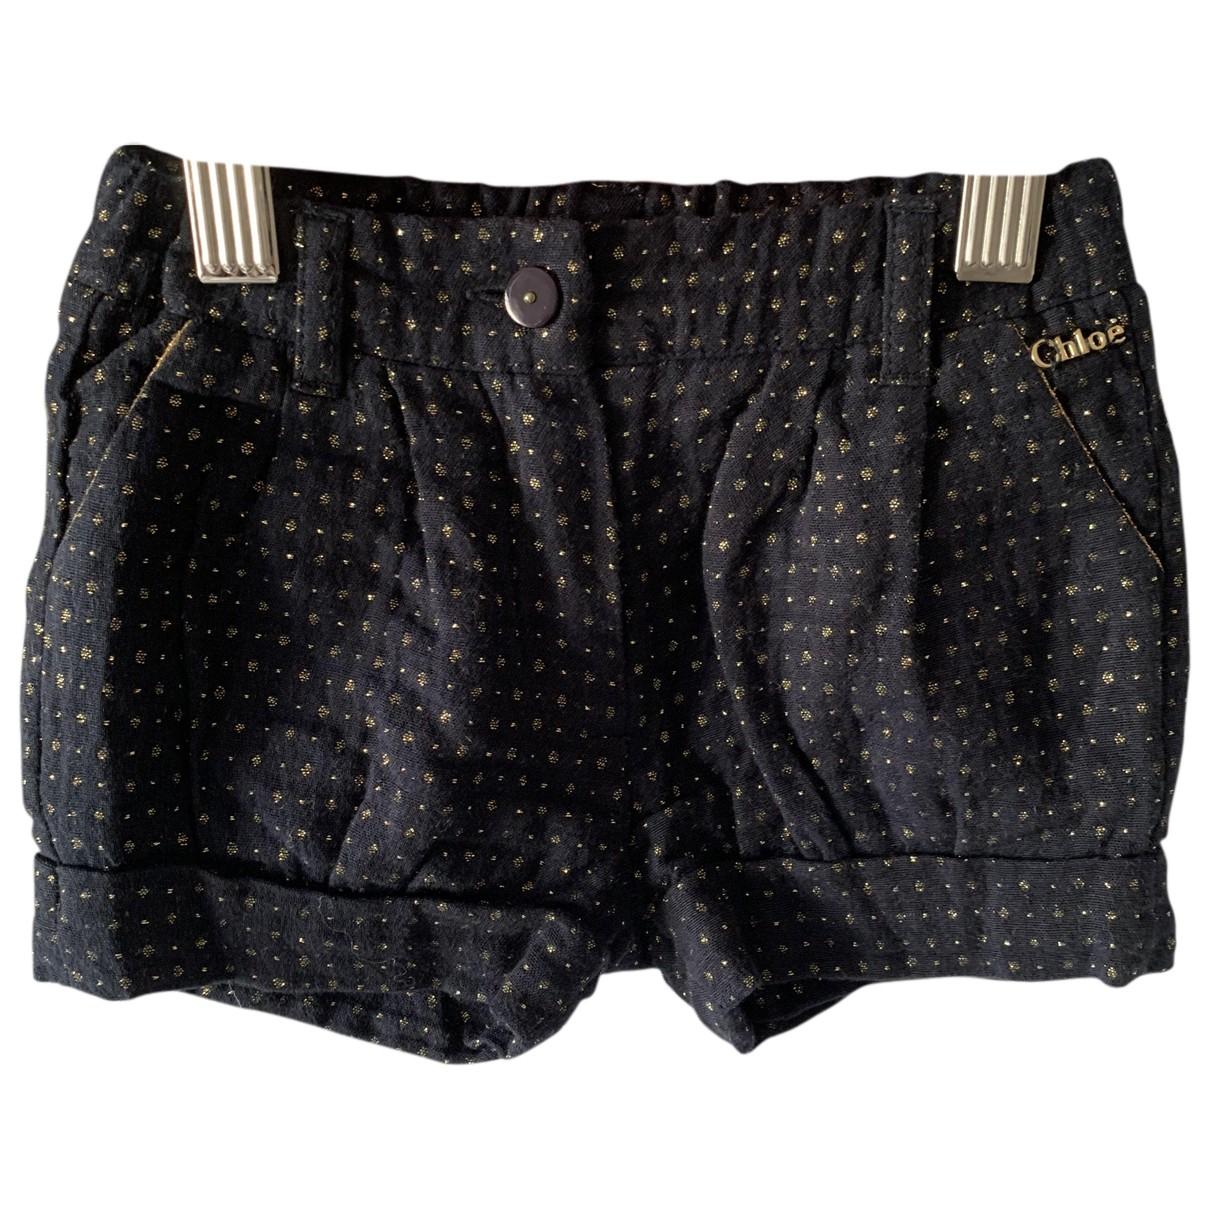 Pantalon corto Chloe